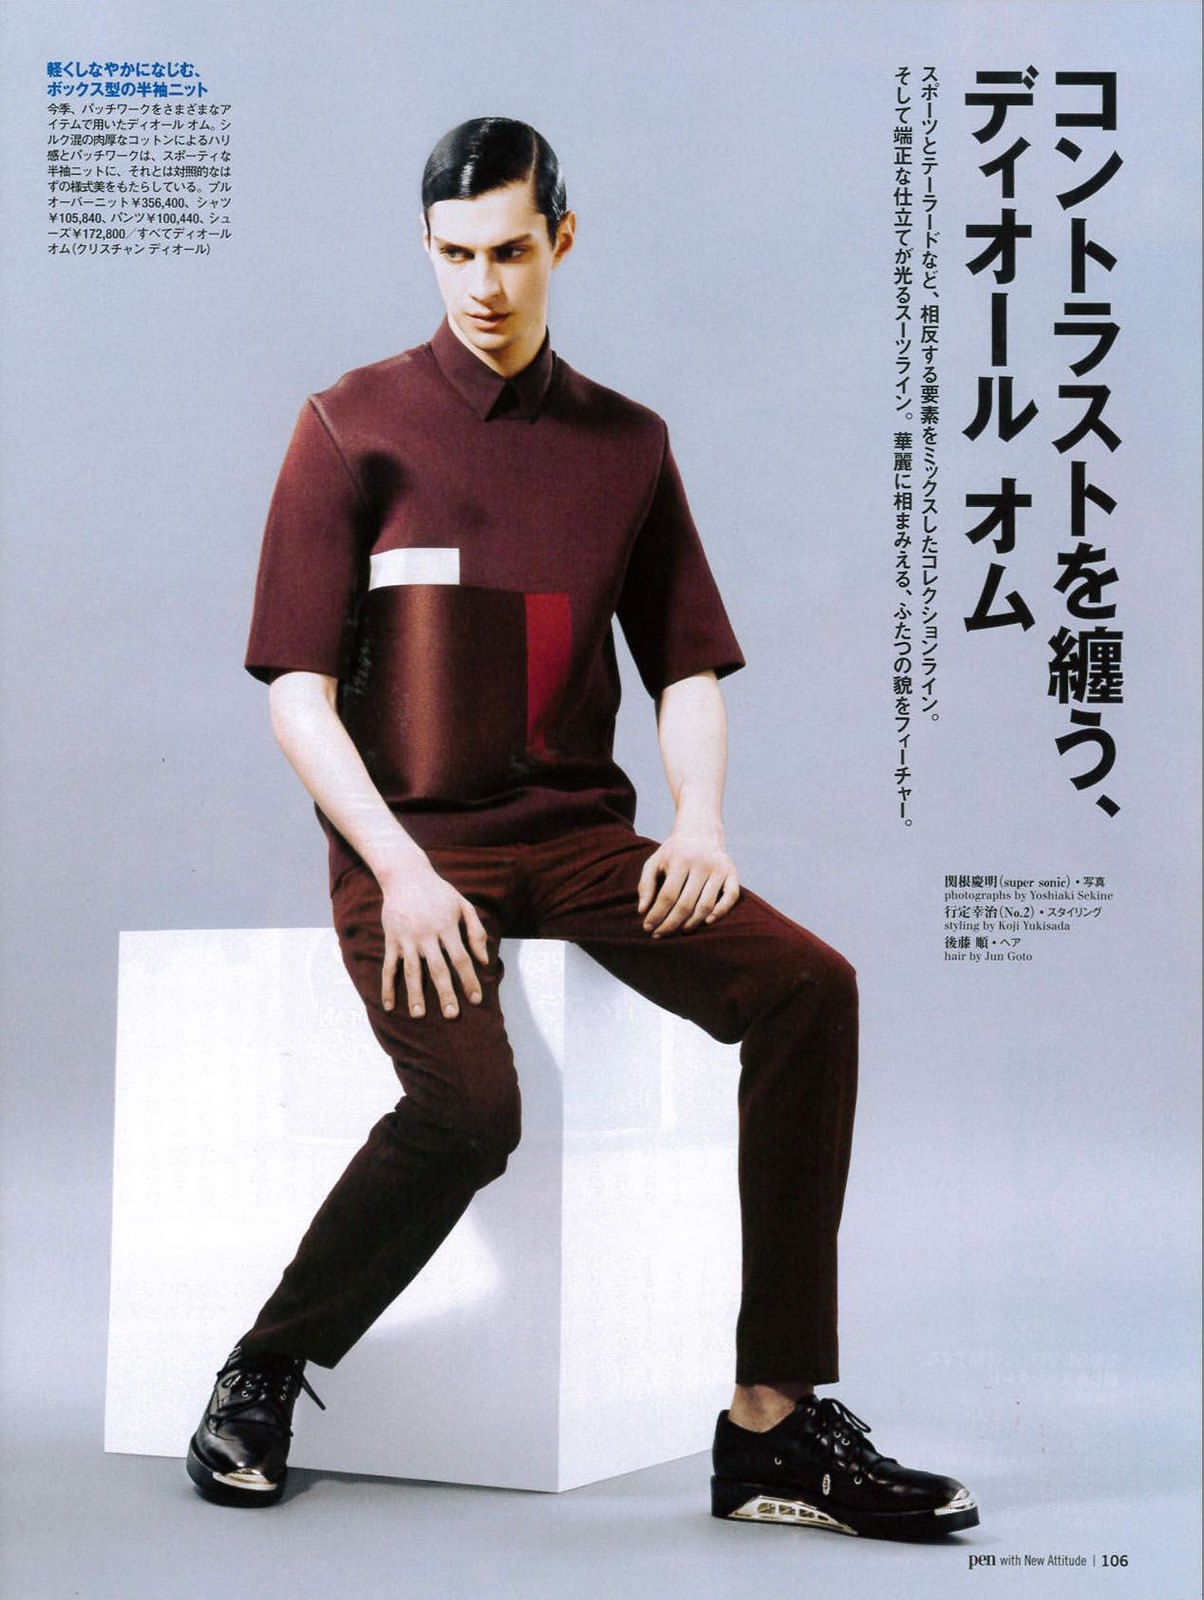 Matthew Bell0057_pen No.358 Dior Homme(super sonic)